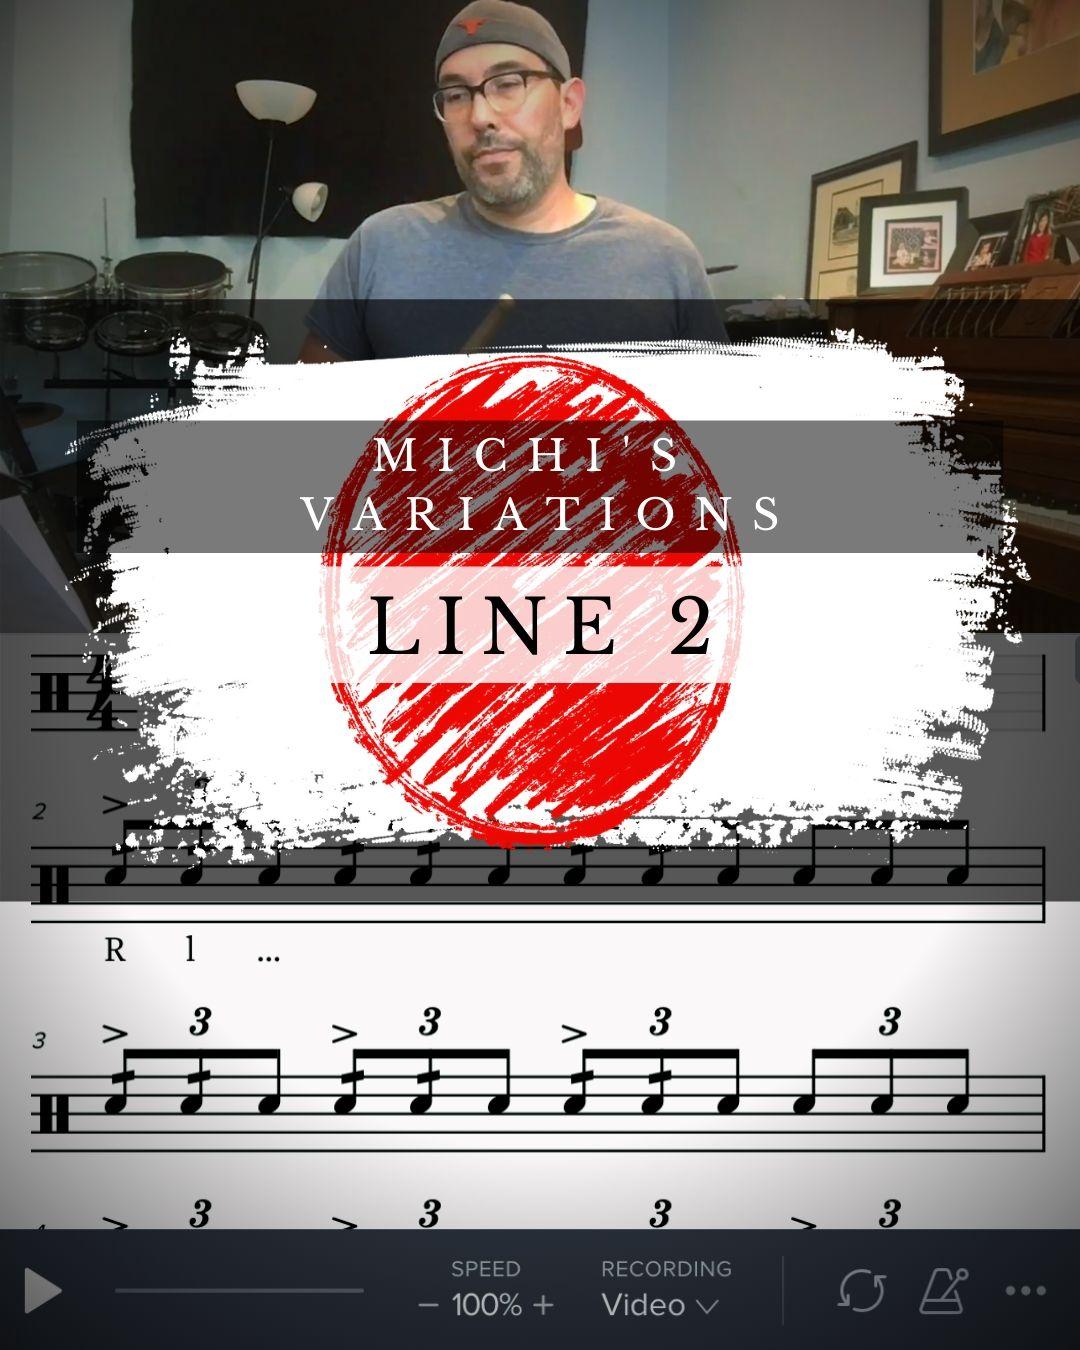 Michi's Variations Line 2